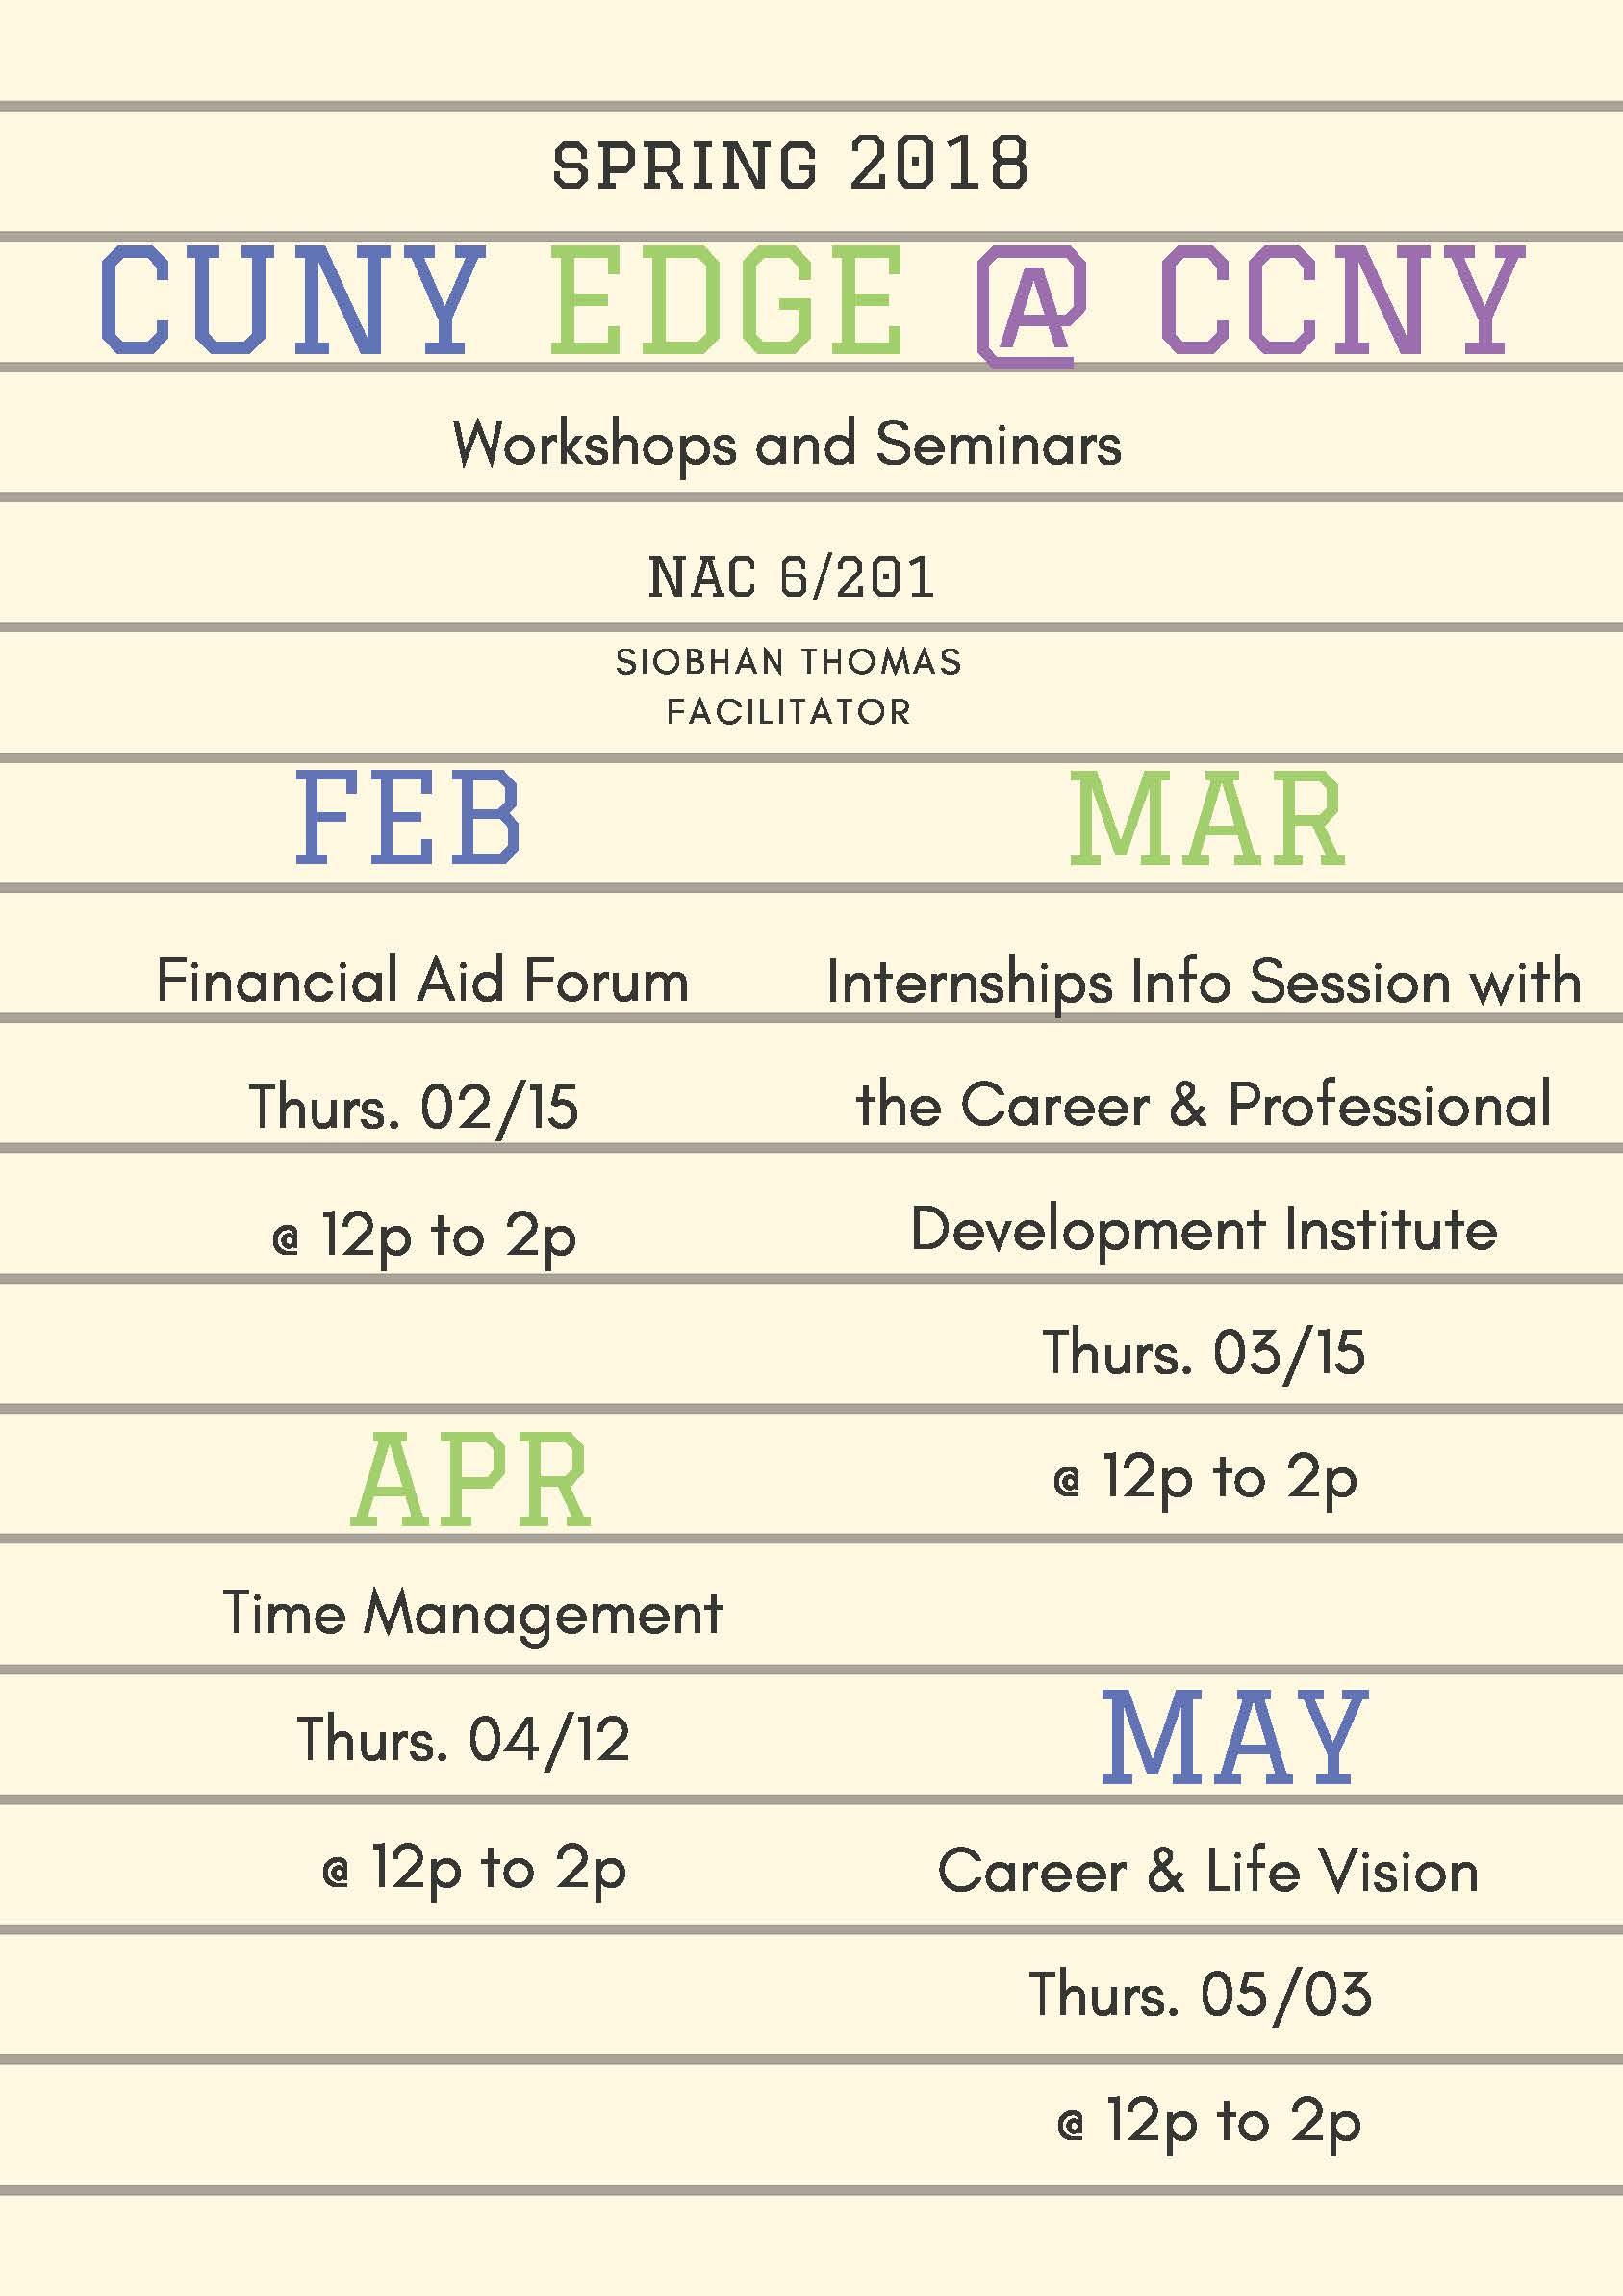 CUNY EDGE Workshops Spring 2018